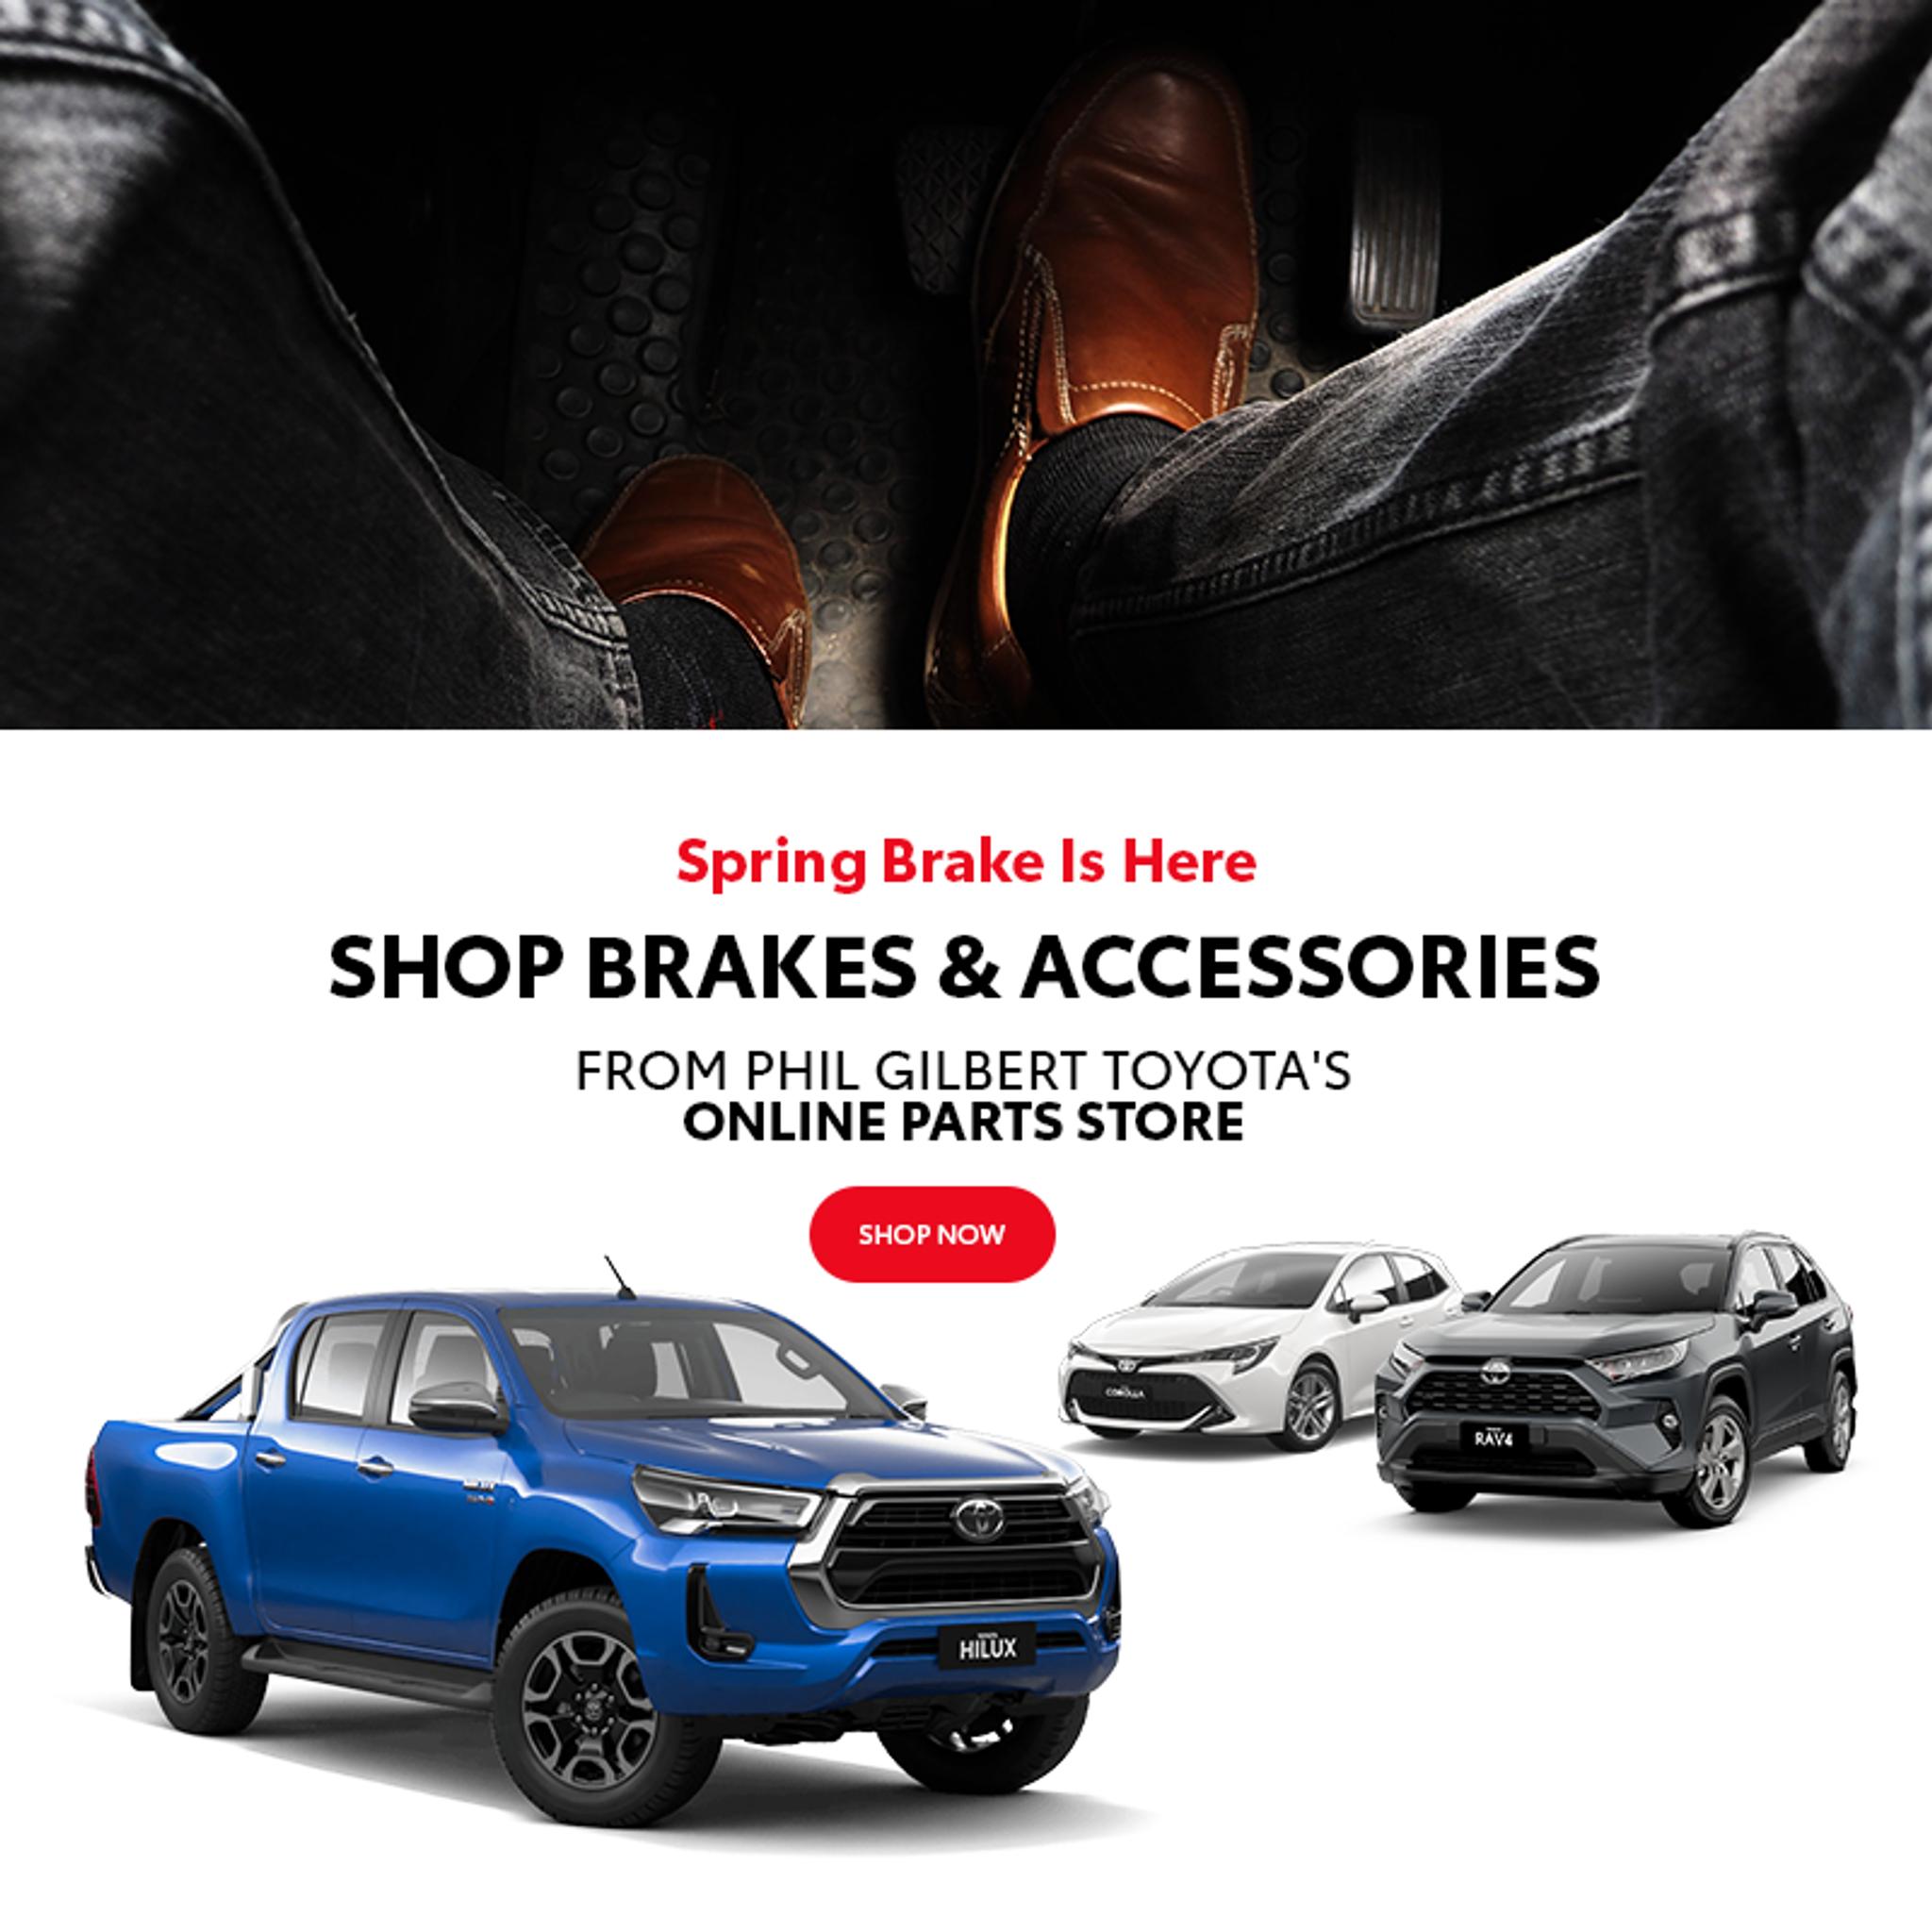 2020 Spring Brake Sale is here | Phil Gilbert Toyota